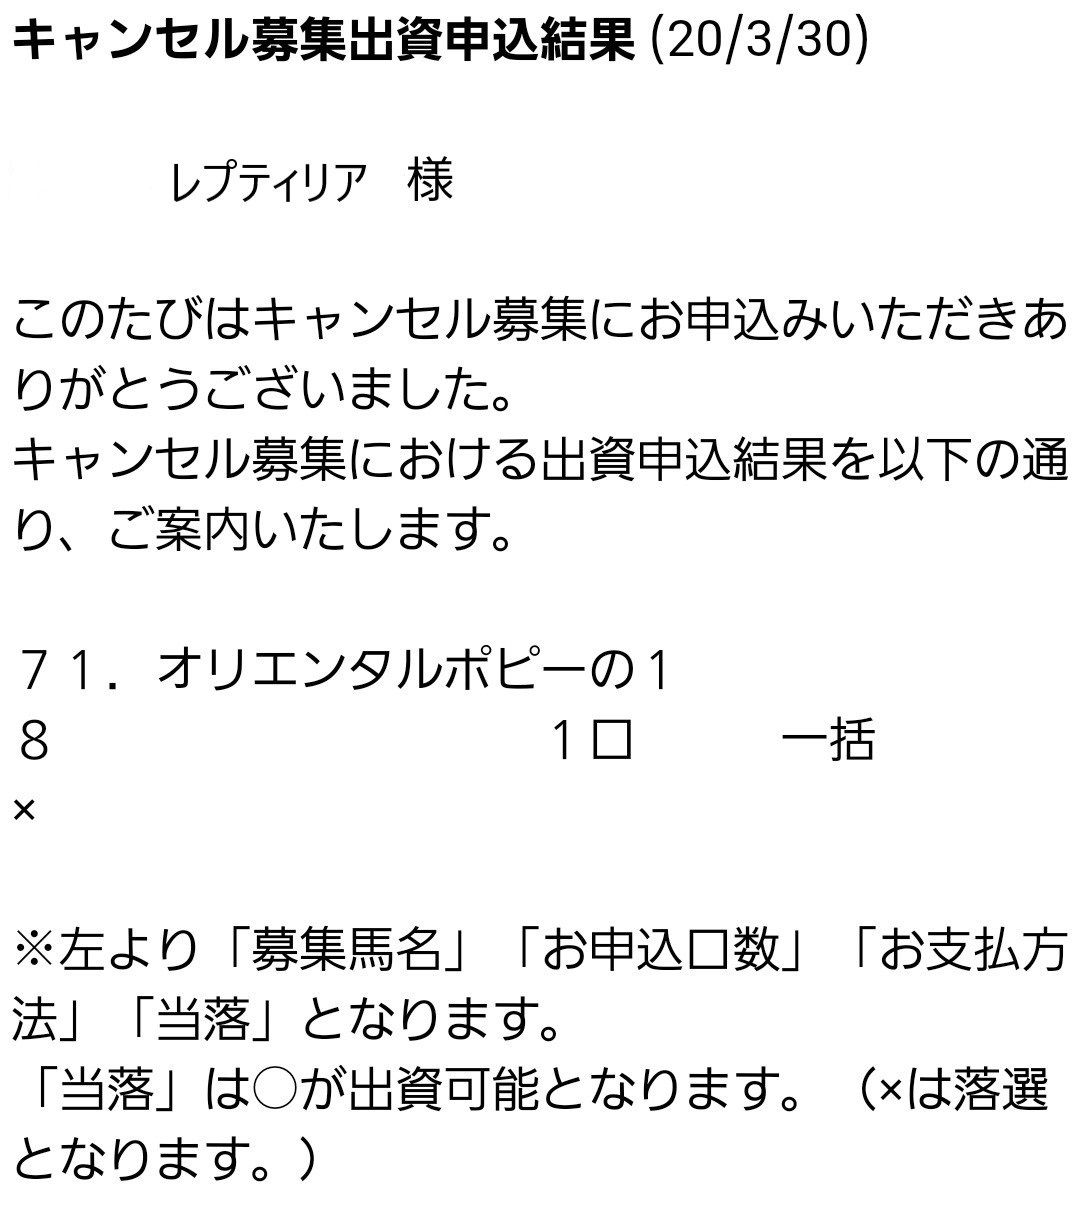 200330carrot_cancel_result.jpg